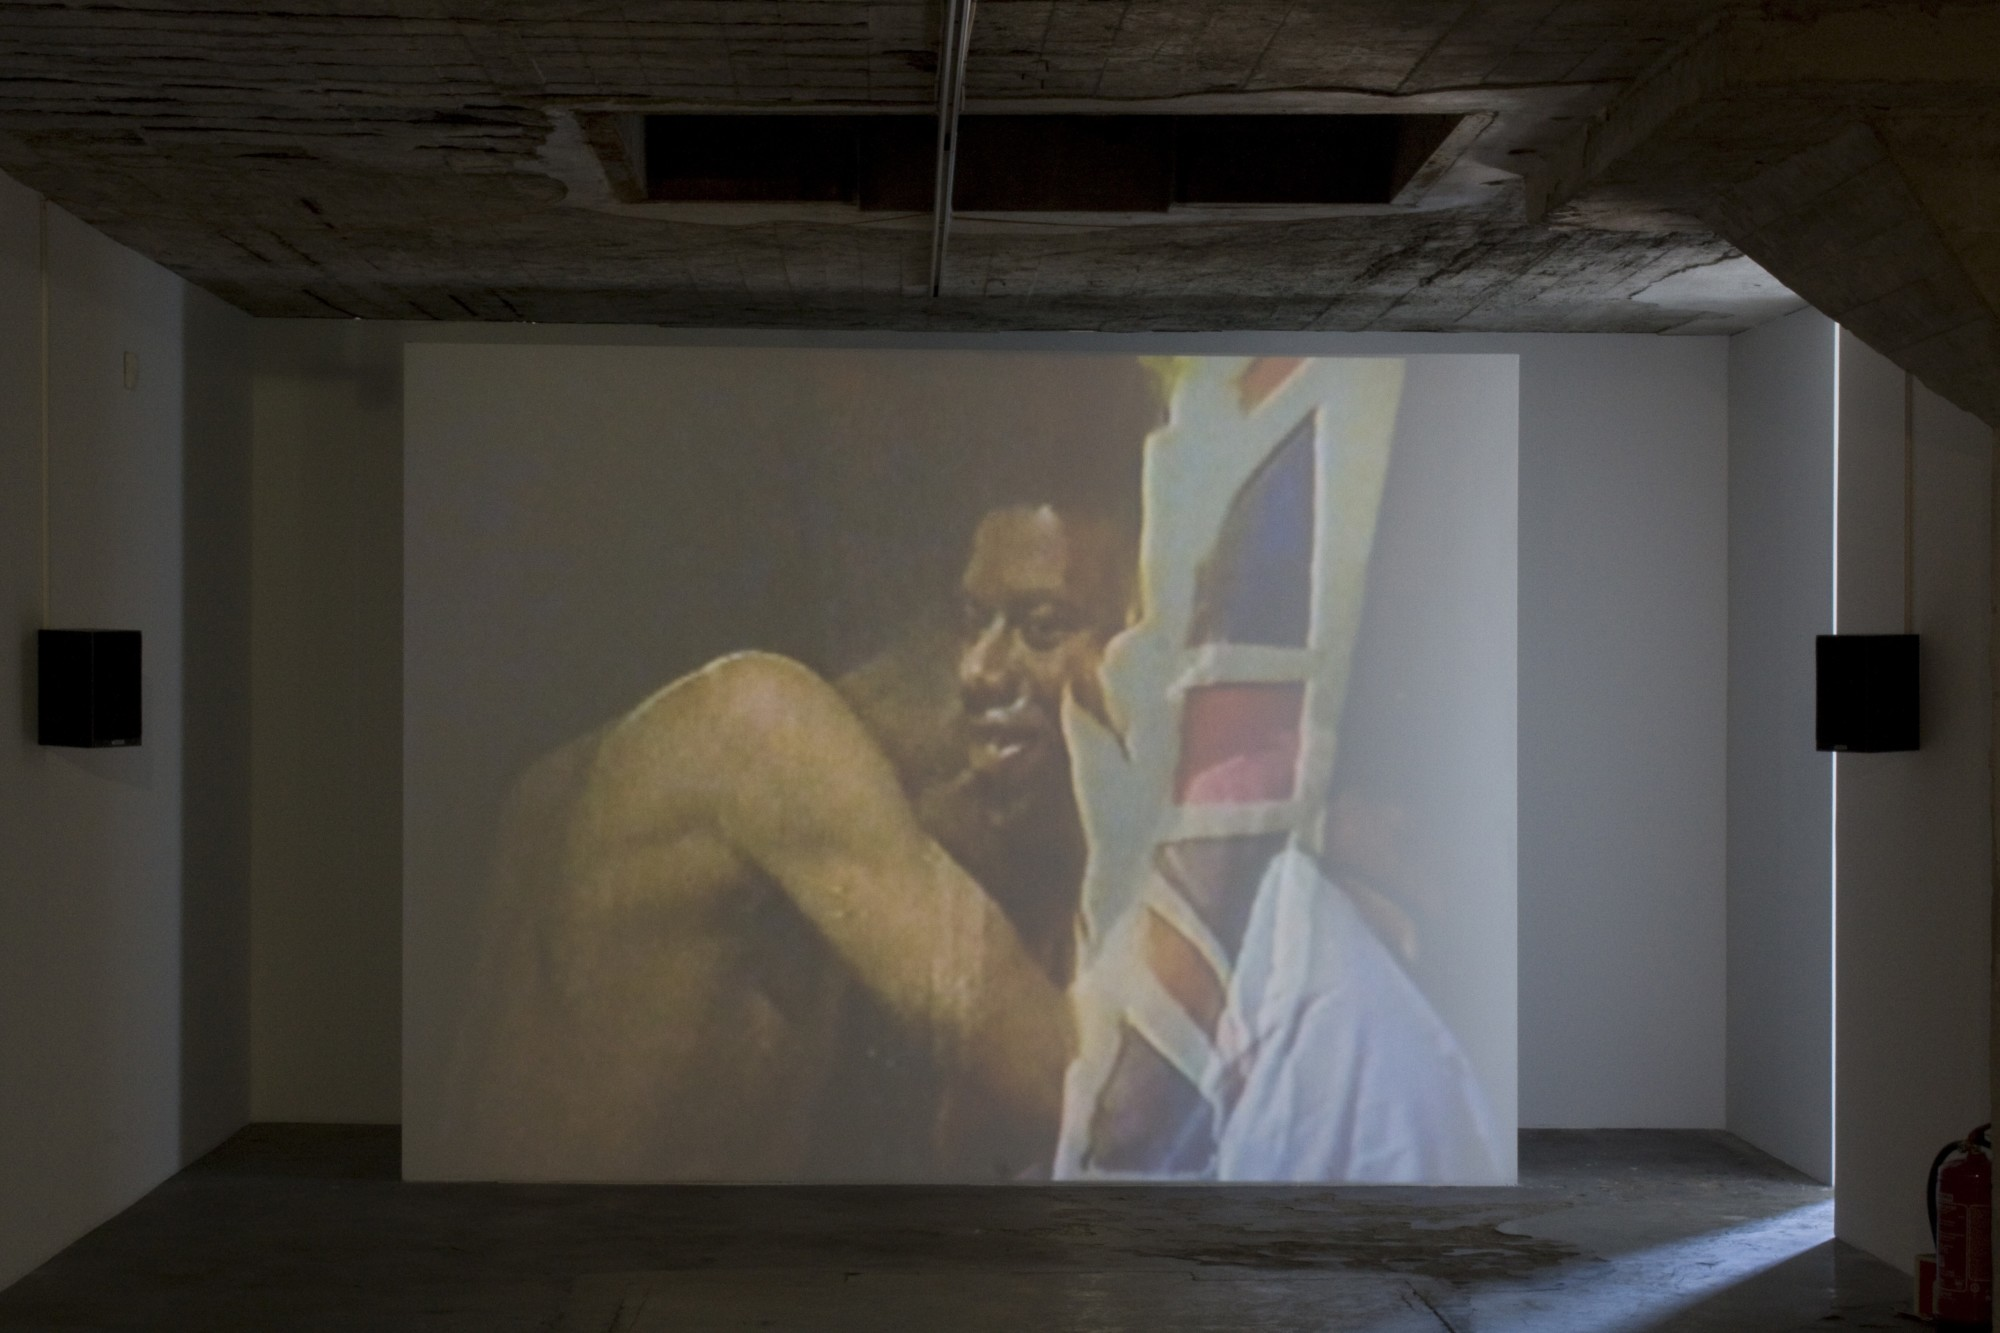 Grand National: Art From Britain. Vestfossen Kunstlaboratorium, Øvre Eiker, Norway, 2010  24'06'', single-screen projection, 16mm film transferred to digital, colour, sound